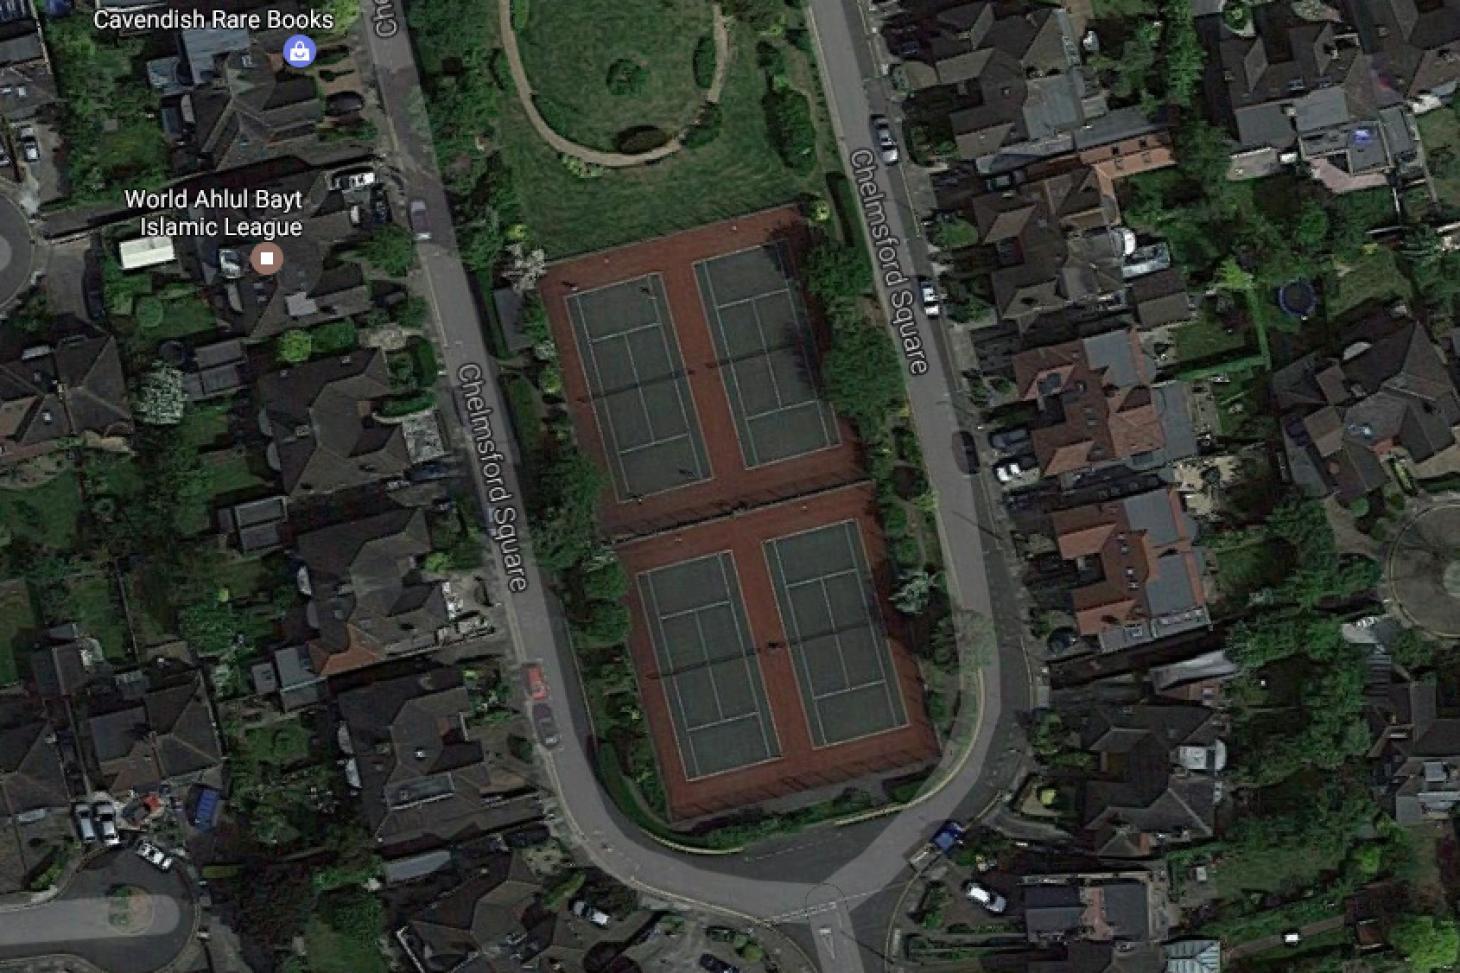 Chelmsford Square Open Space Outdoor | Hard (macadam) tennis court